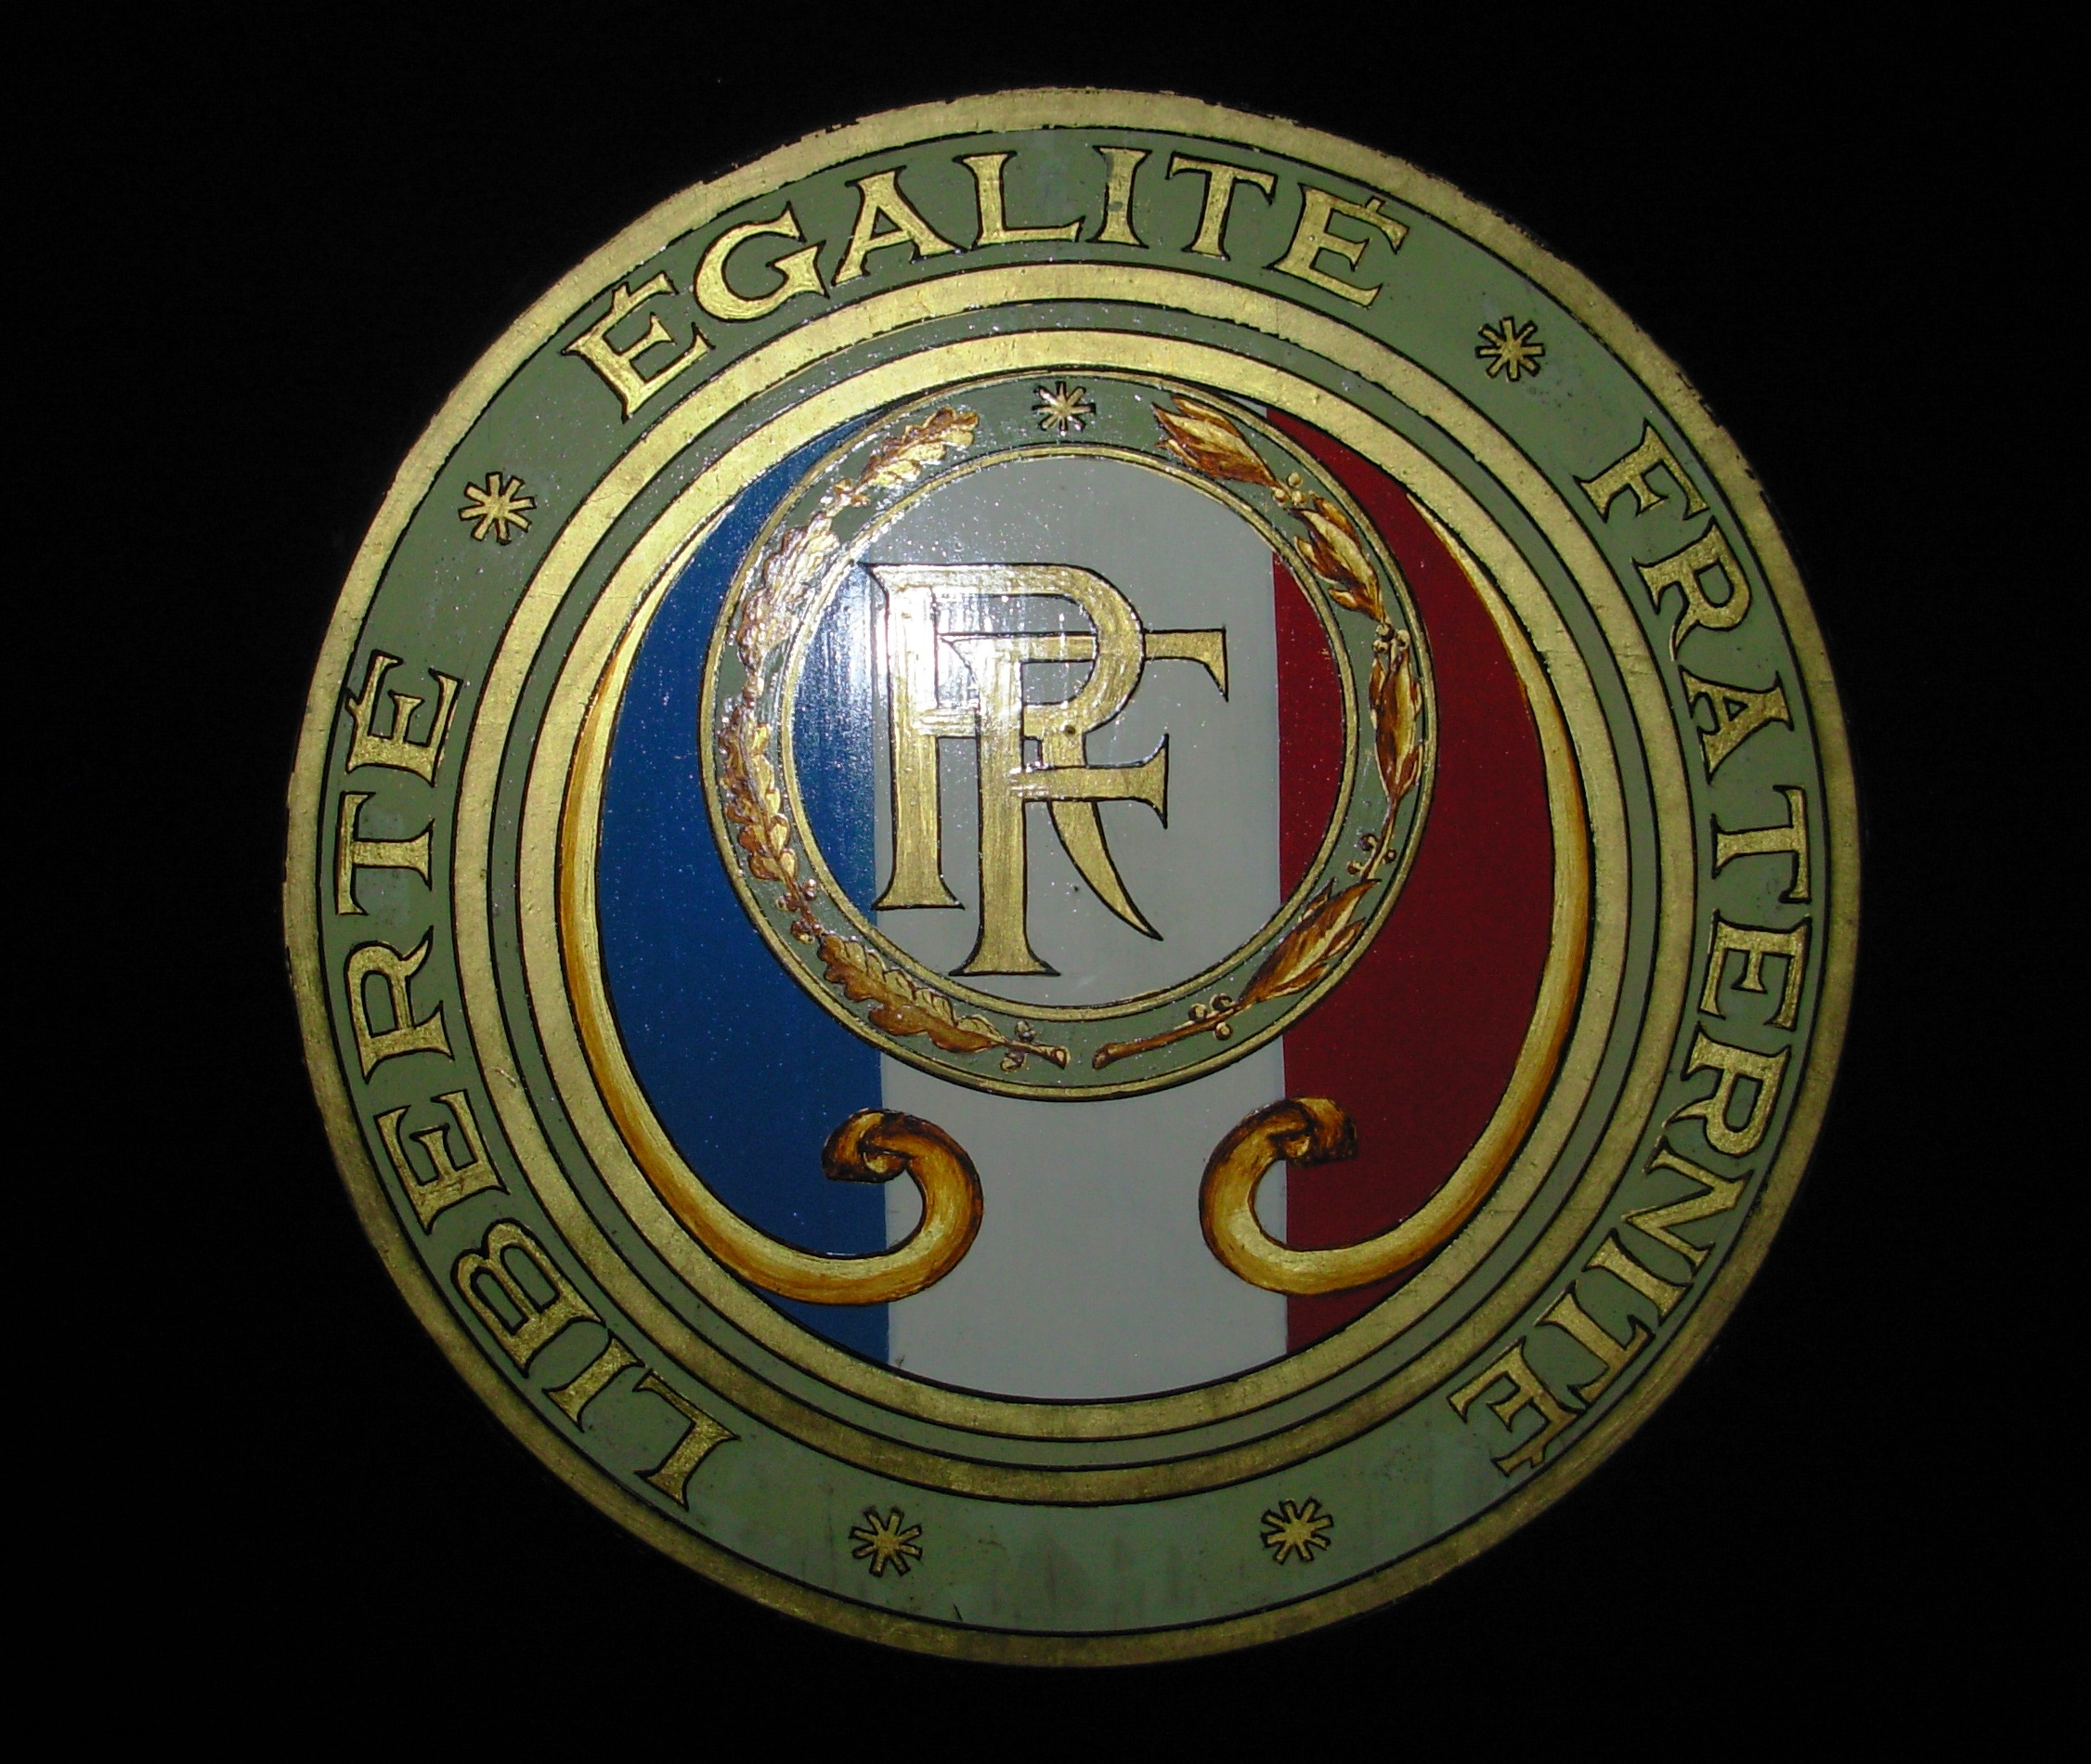 rc3a9pulique_franc3a7ase_-_libertc3a9_egalitc3a9_fraternitc3a9.jpg